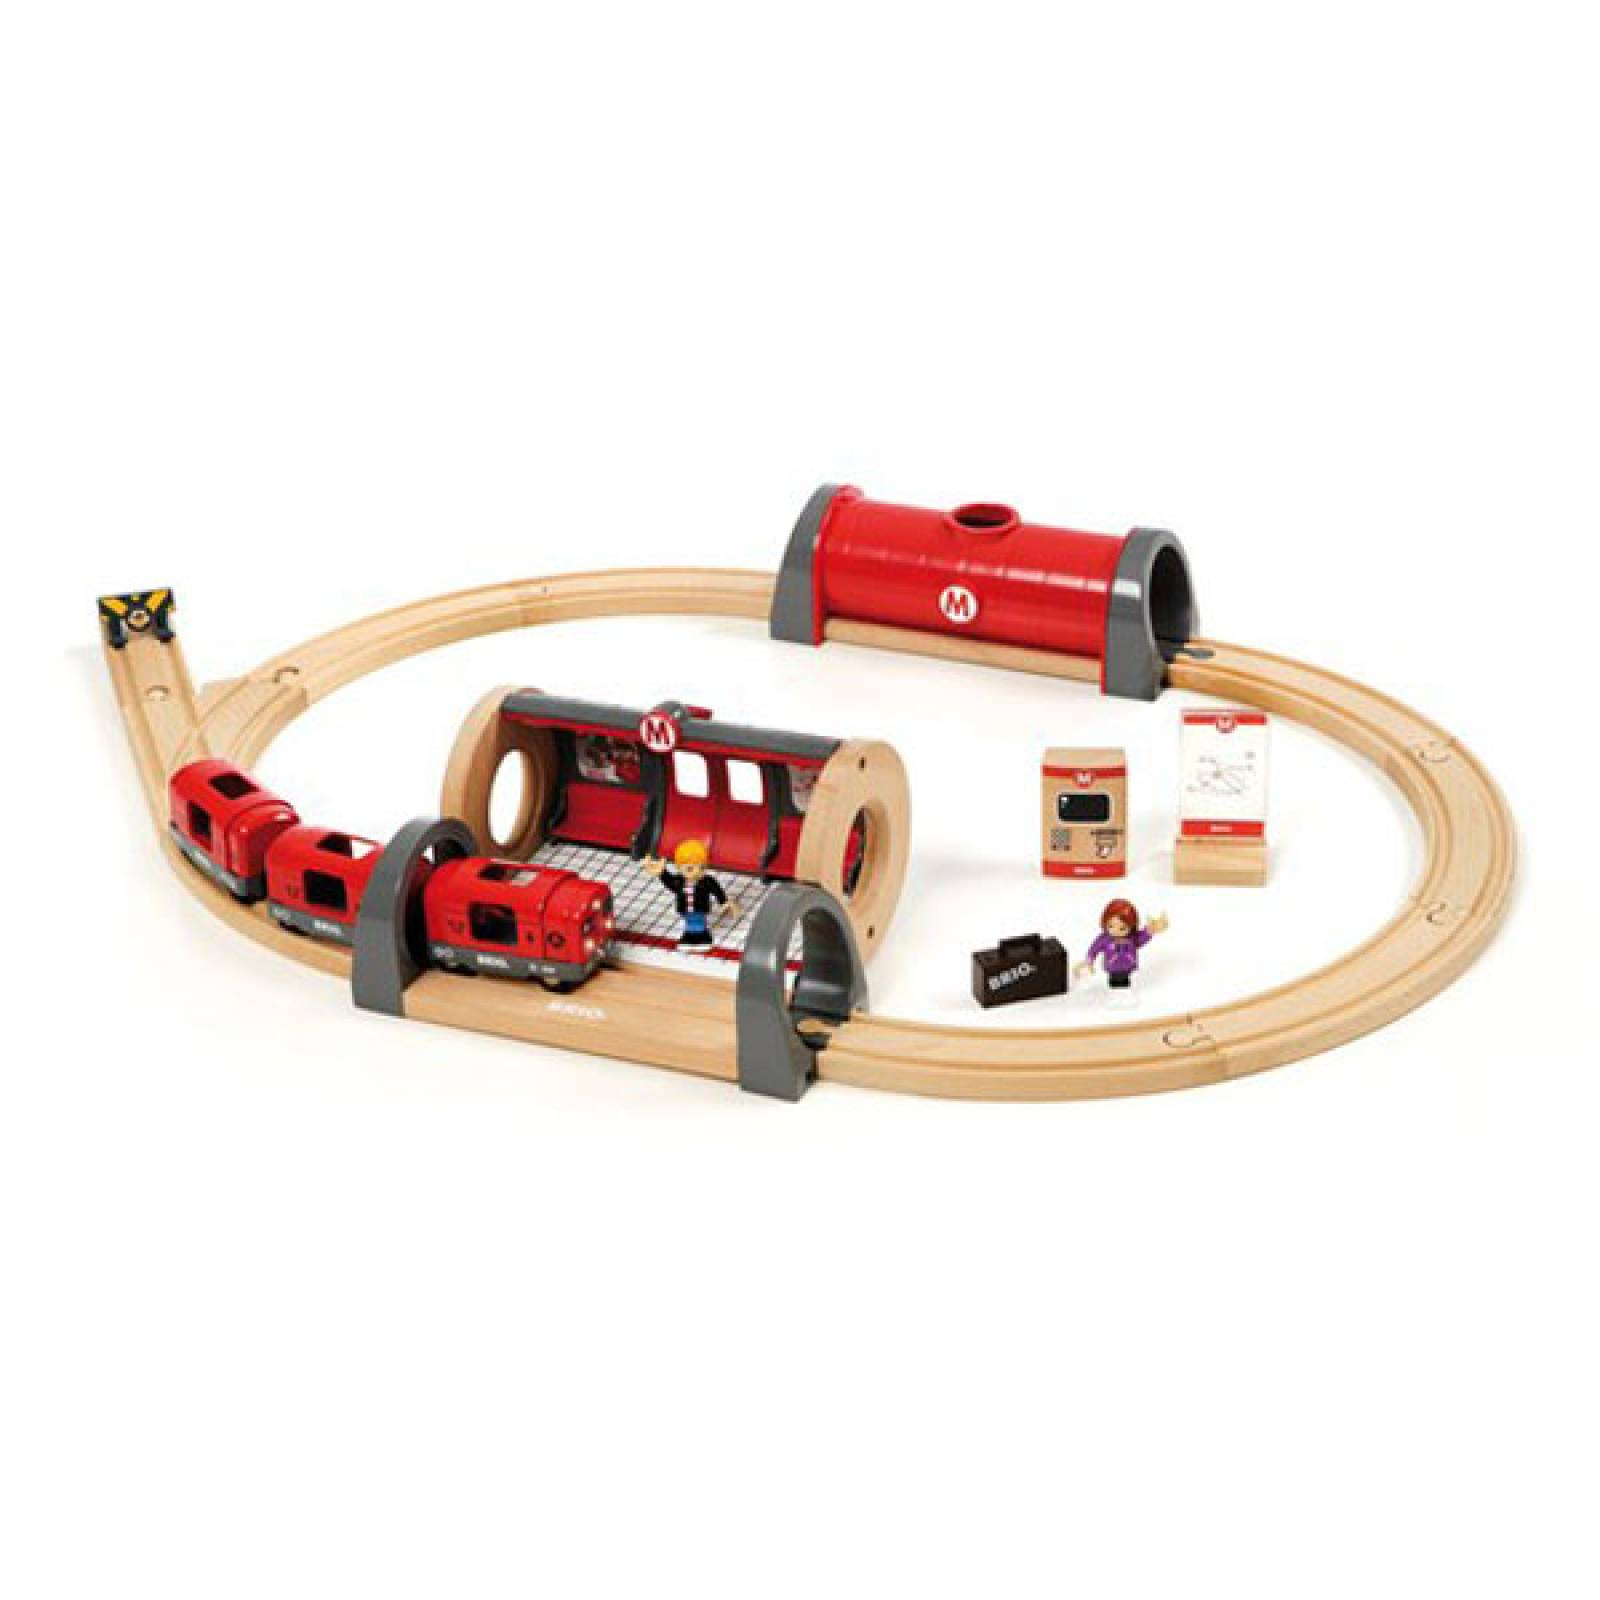 Metro Railway Set BRIO Wooden Railway Age 3+